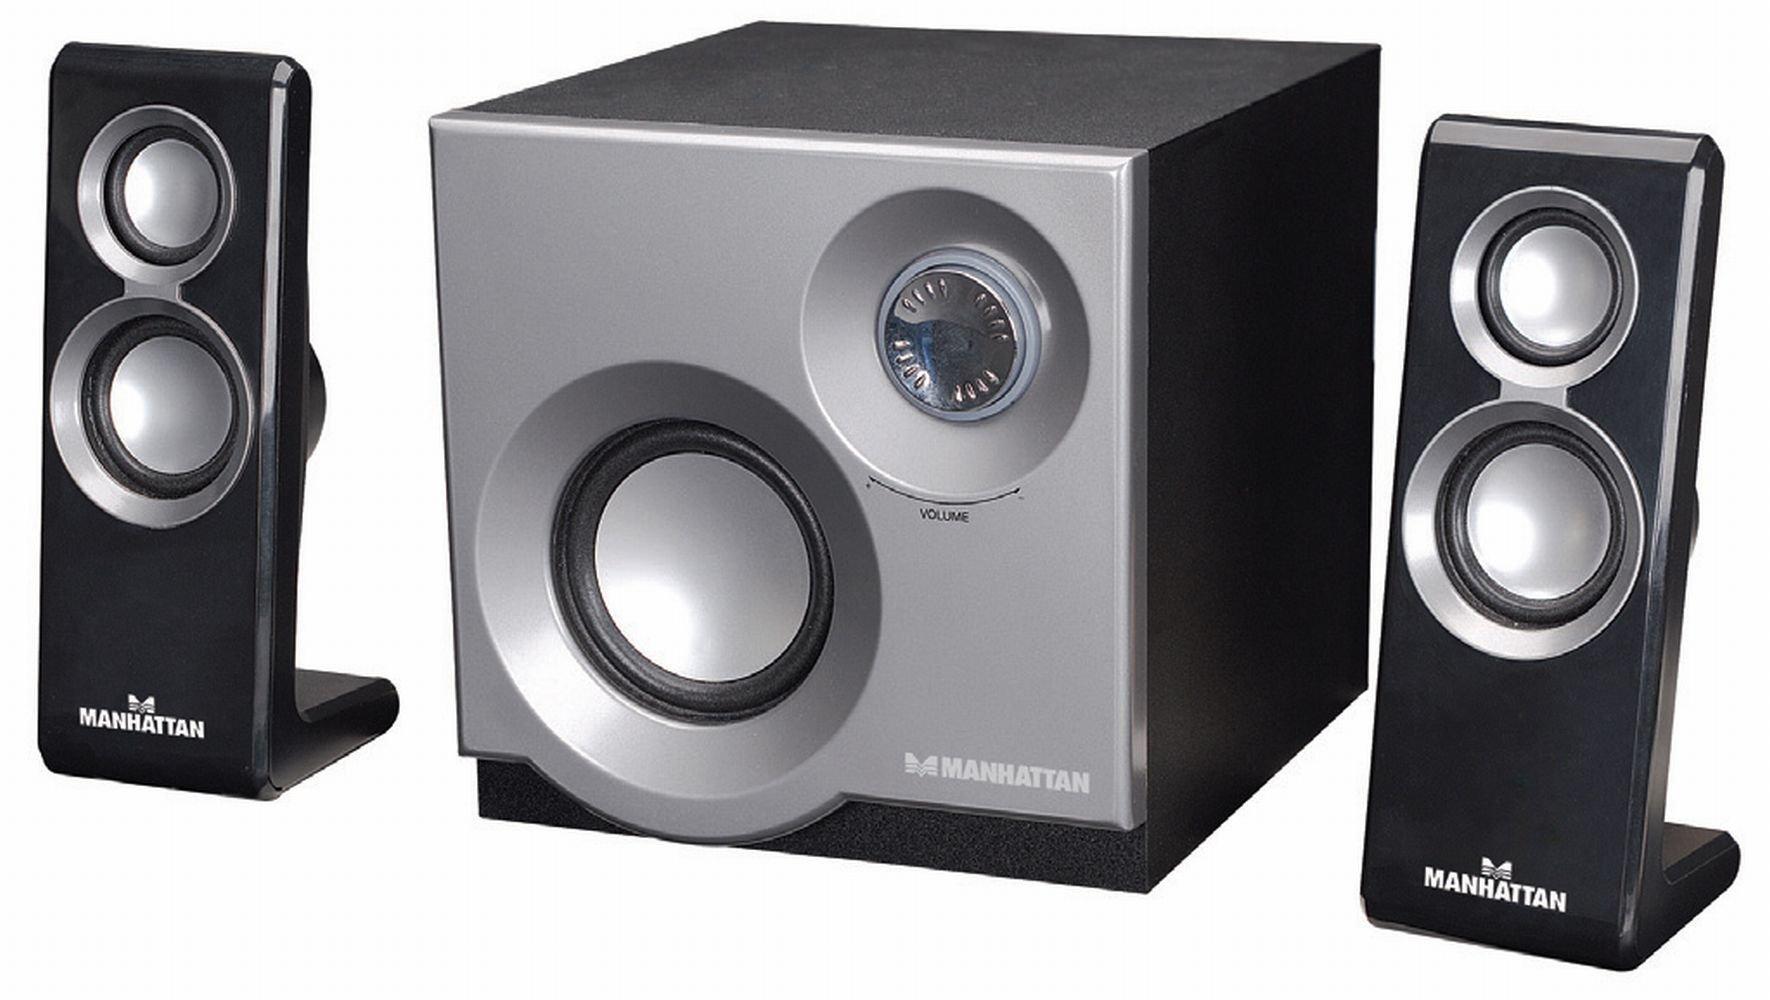 MANHATTAN 3050 2.1 Speaker System with 2 Satellites and 1 Subwoofer (161701)